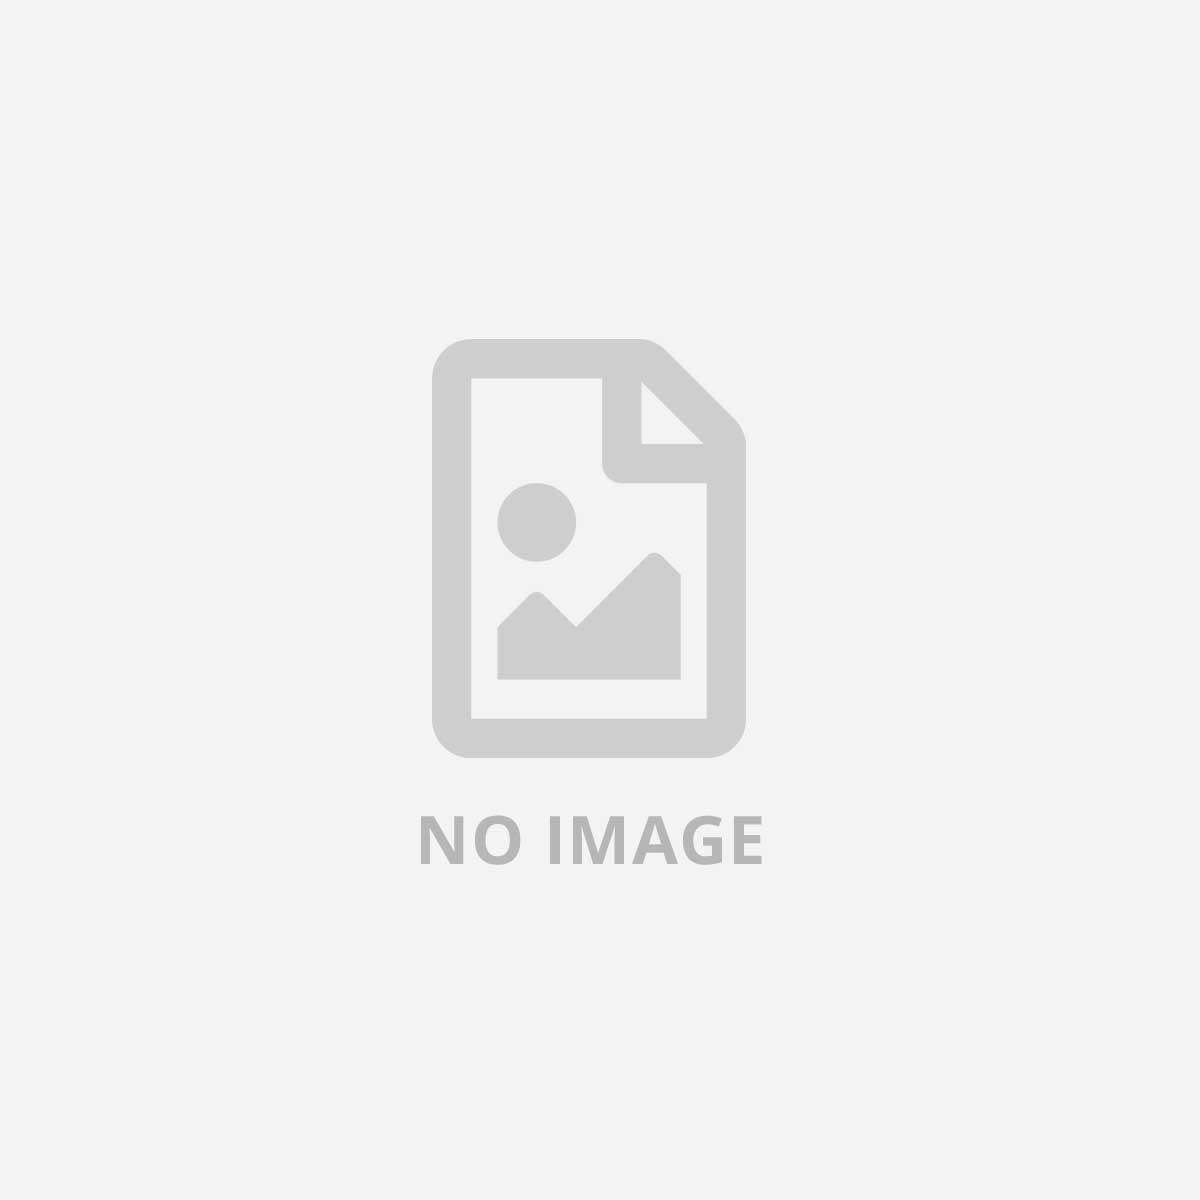 HP RADEON PRO WX 9100 16GB 6 MINIDP